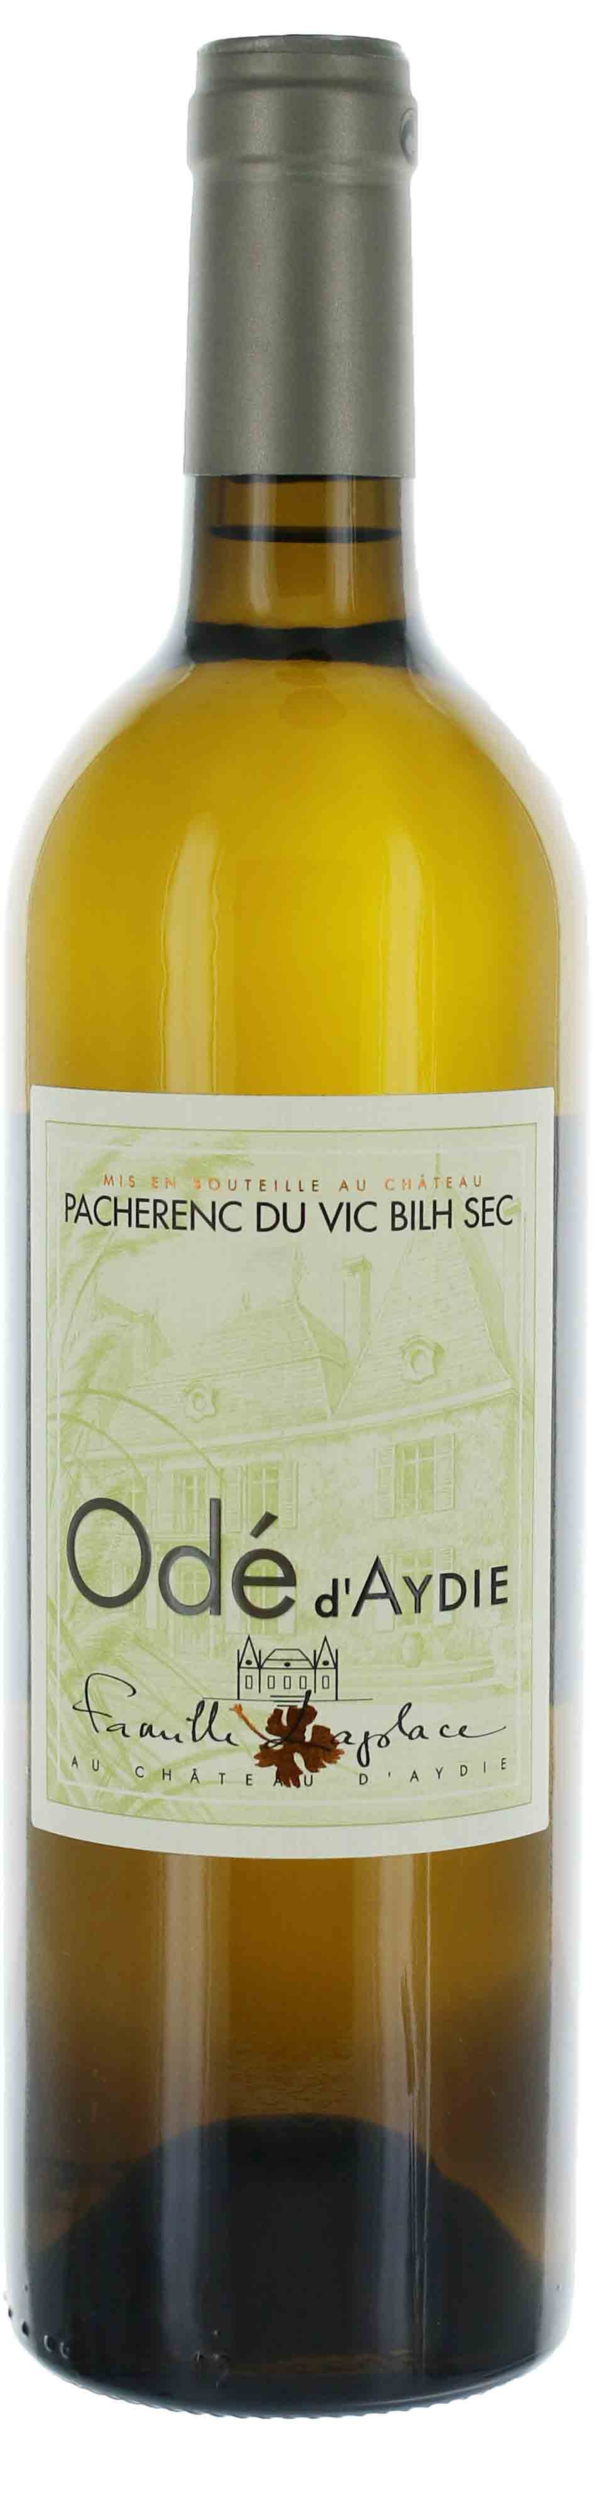 Ode d\'Aydie Pacherenc du Vic - Bilh Blanc sec - Château D\'Aydie - 2019